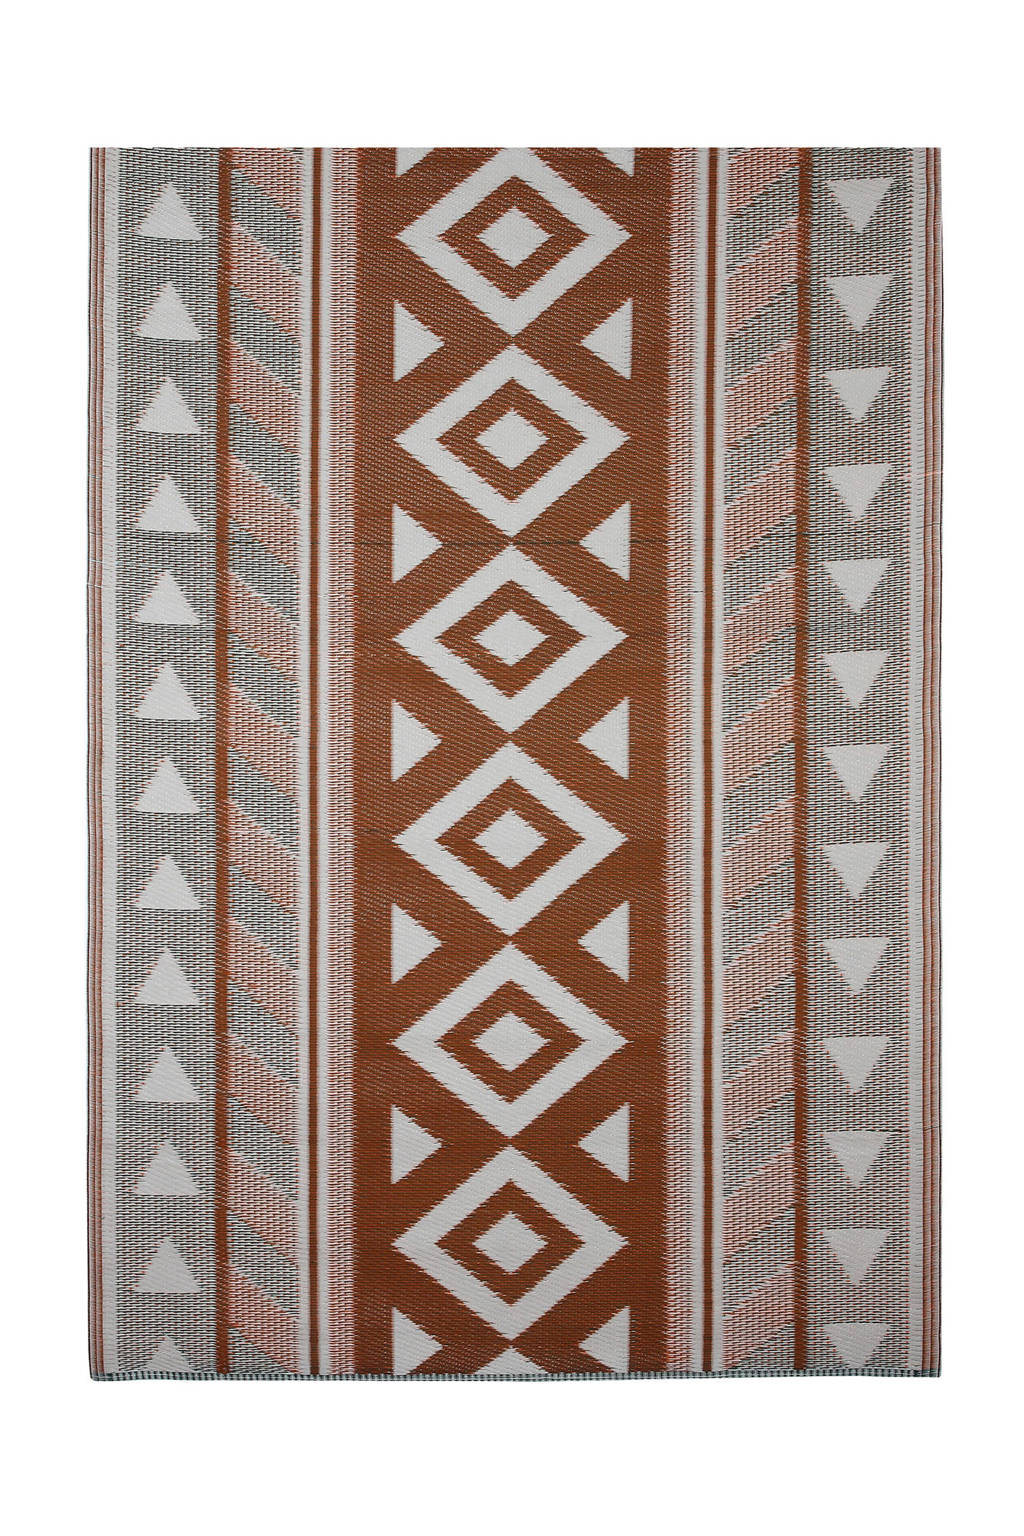 Mica vloerkleed (180x120 cm), Rood